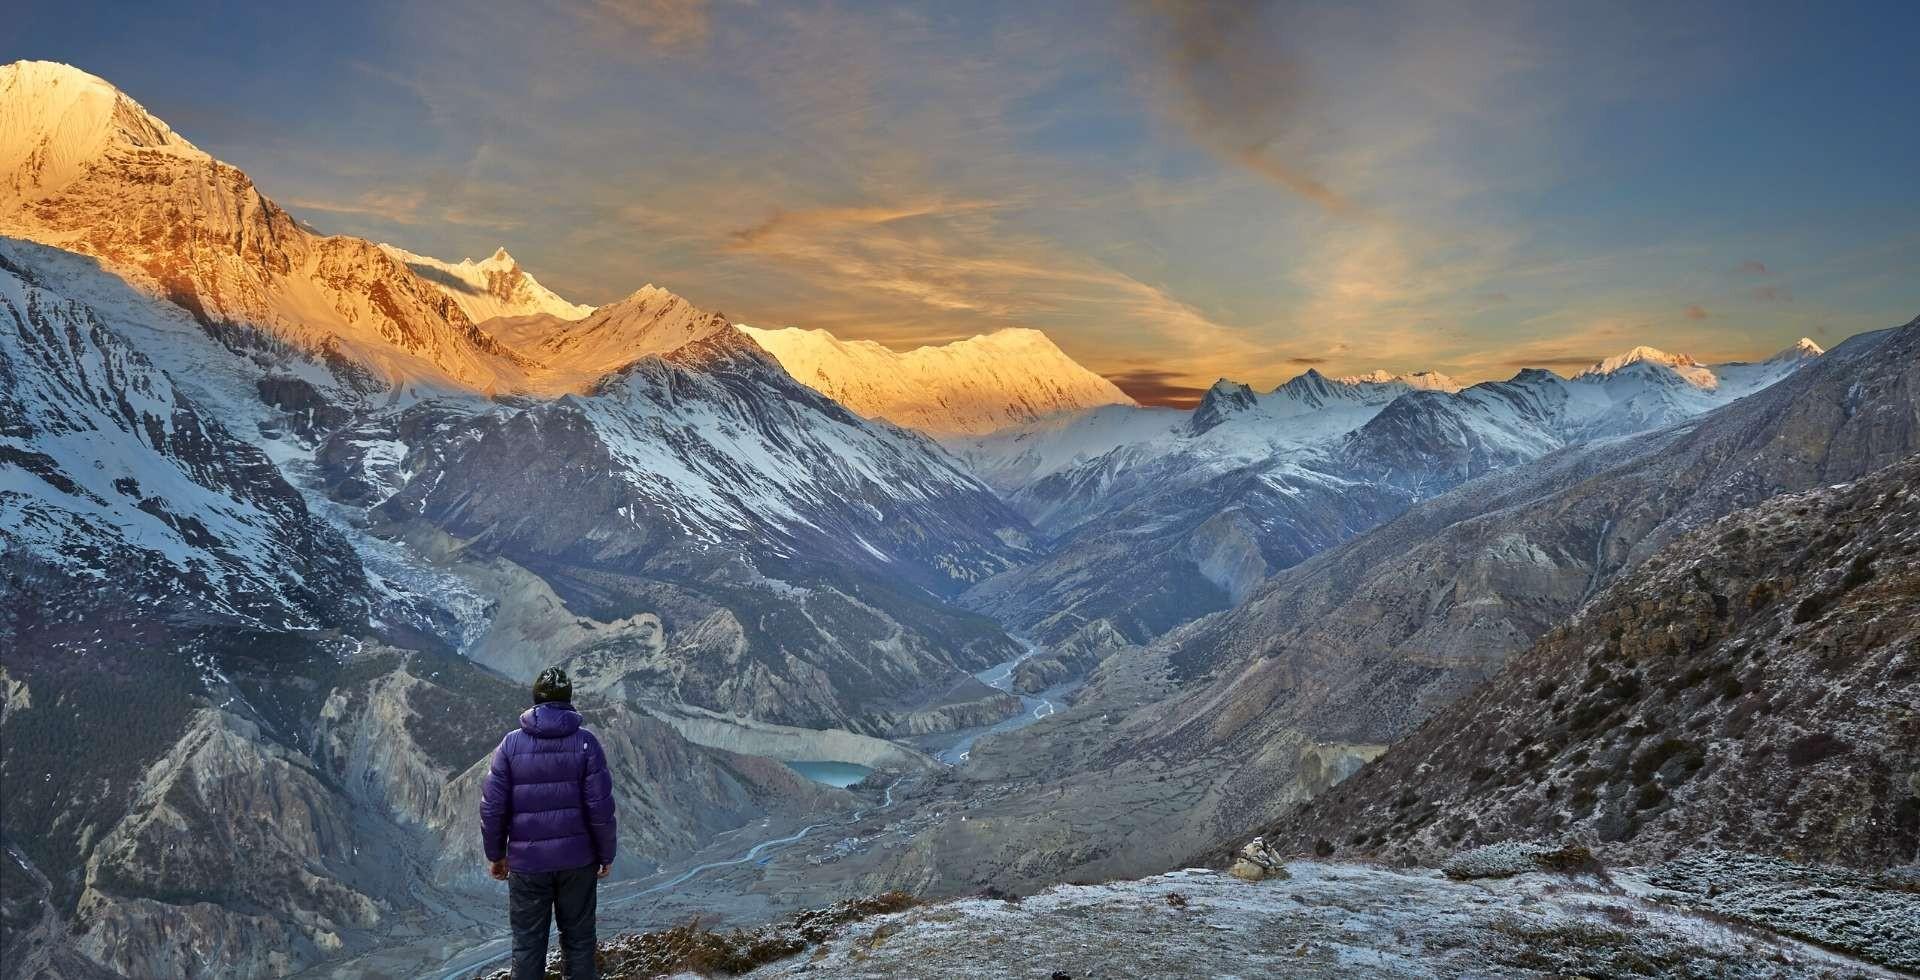 nepal blog, travel blog to nepal